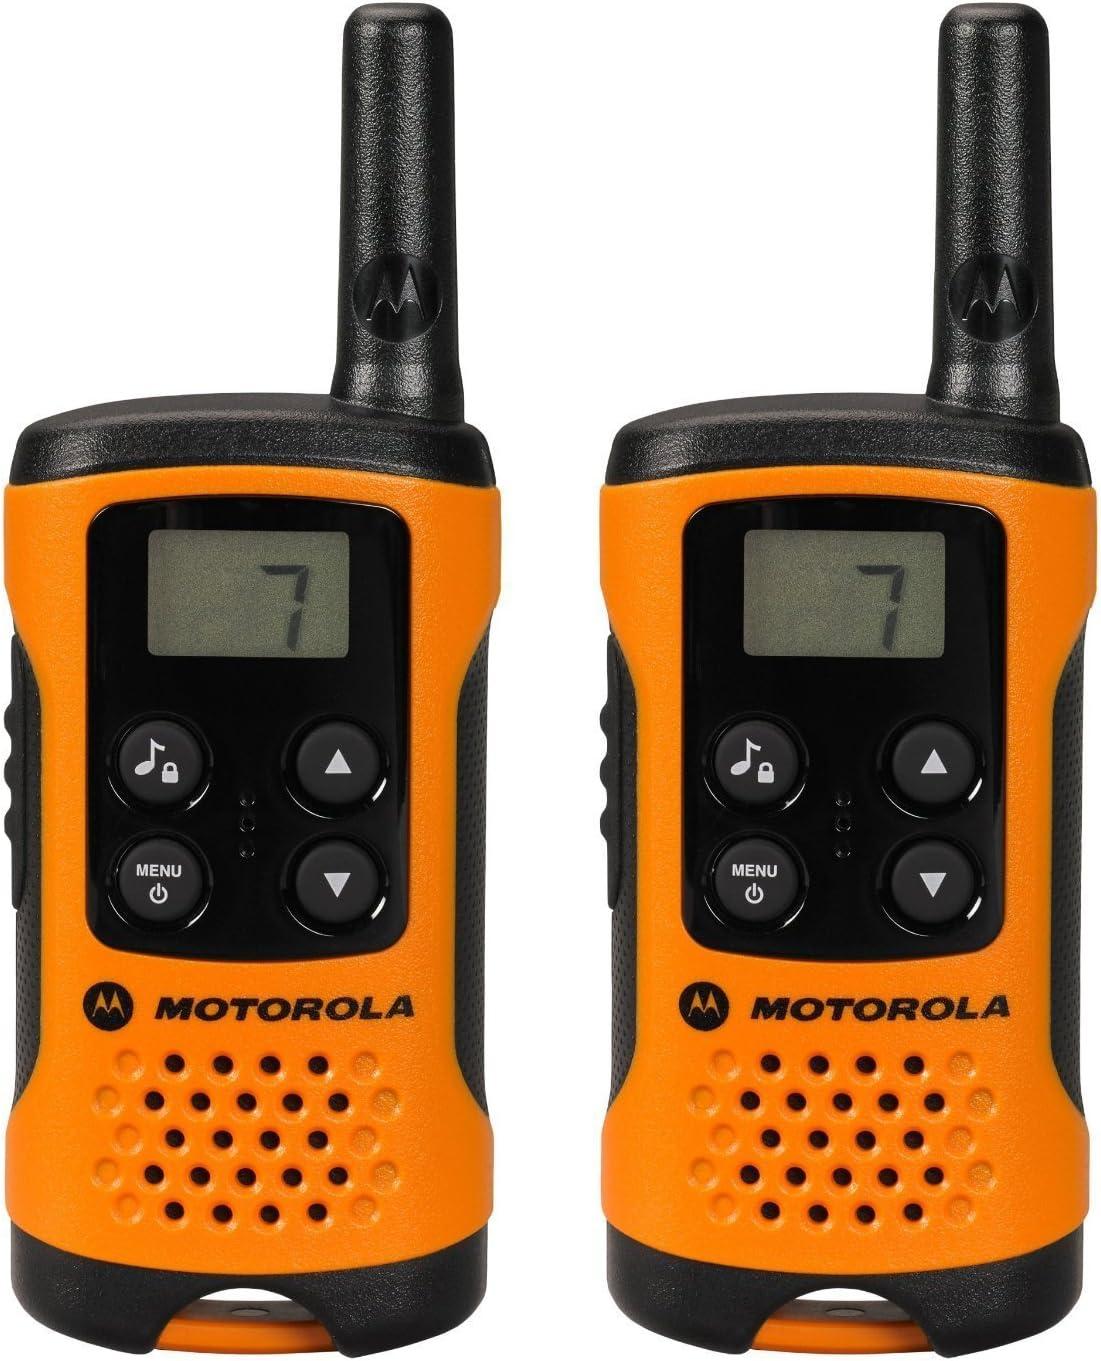 Motorola TLKR T41 Walkie-Talkie, Pantalla LCD, Naranja, paquete de 2 unidades